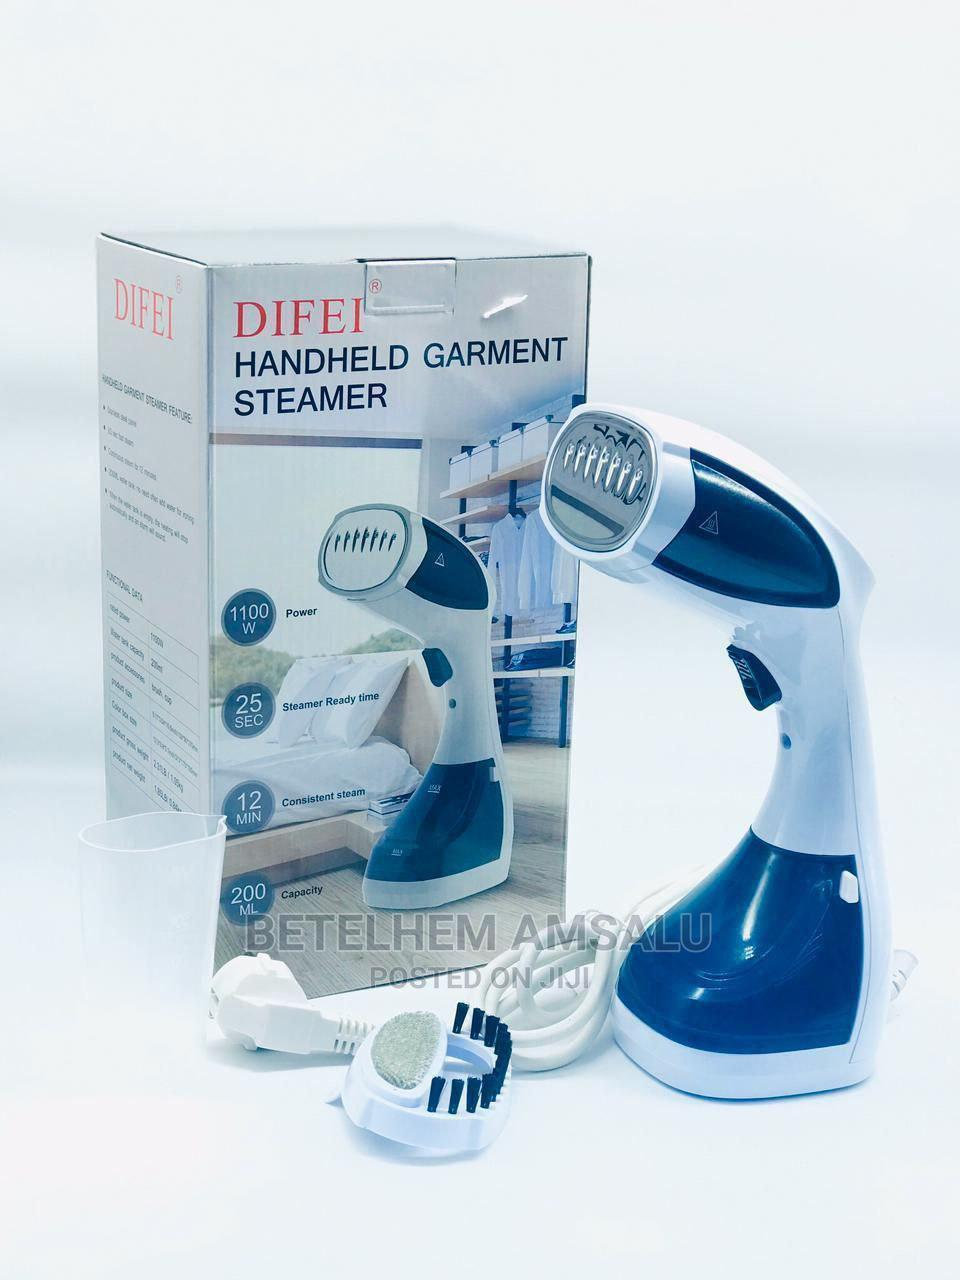 Handheld Garment Steamer